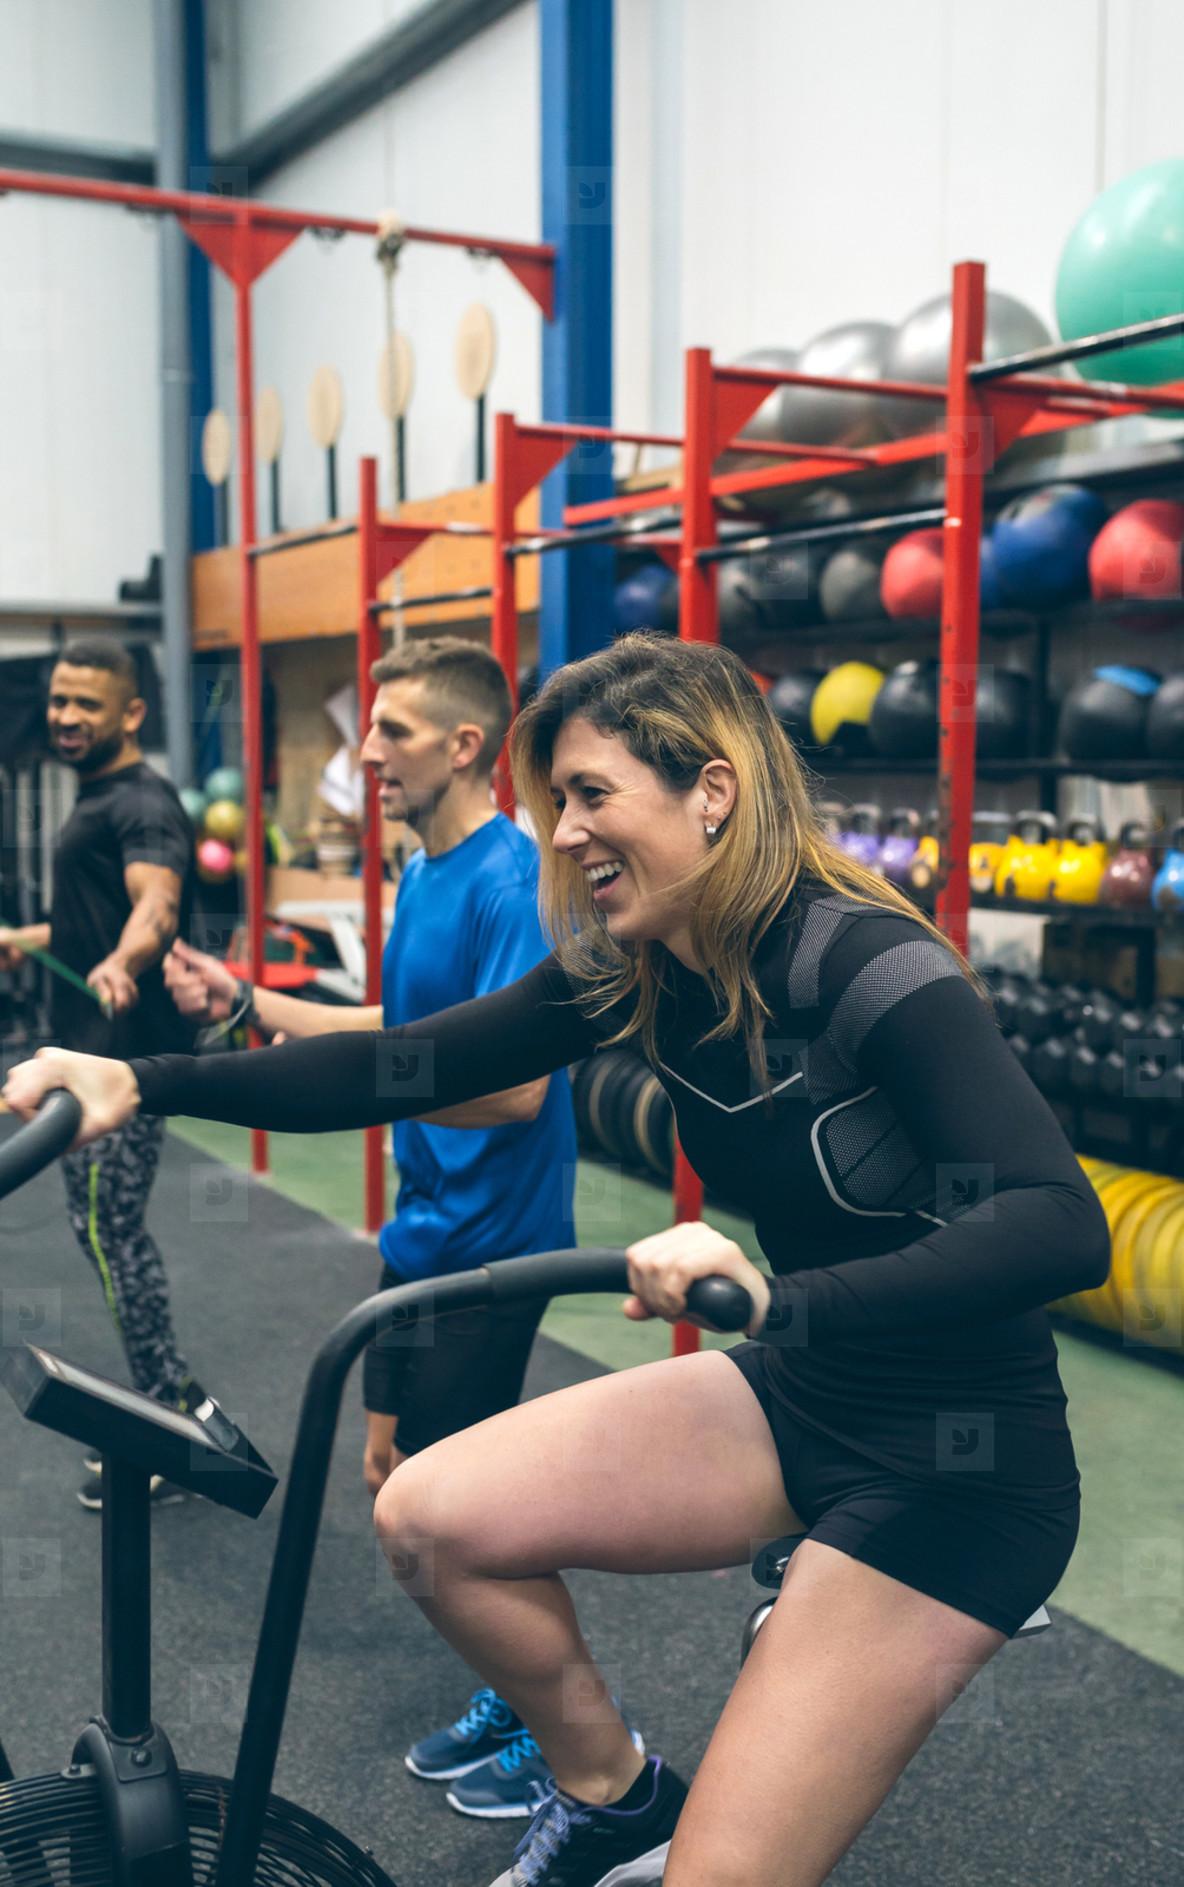 Sportswoman doing air bike at the gym